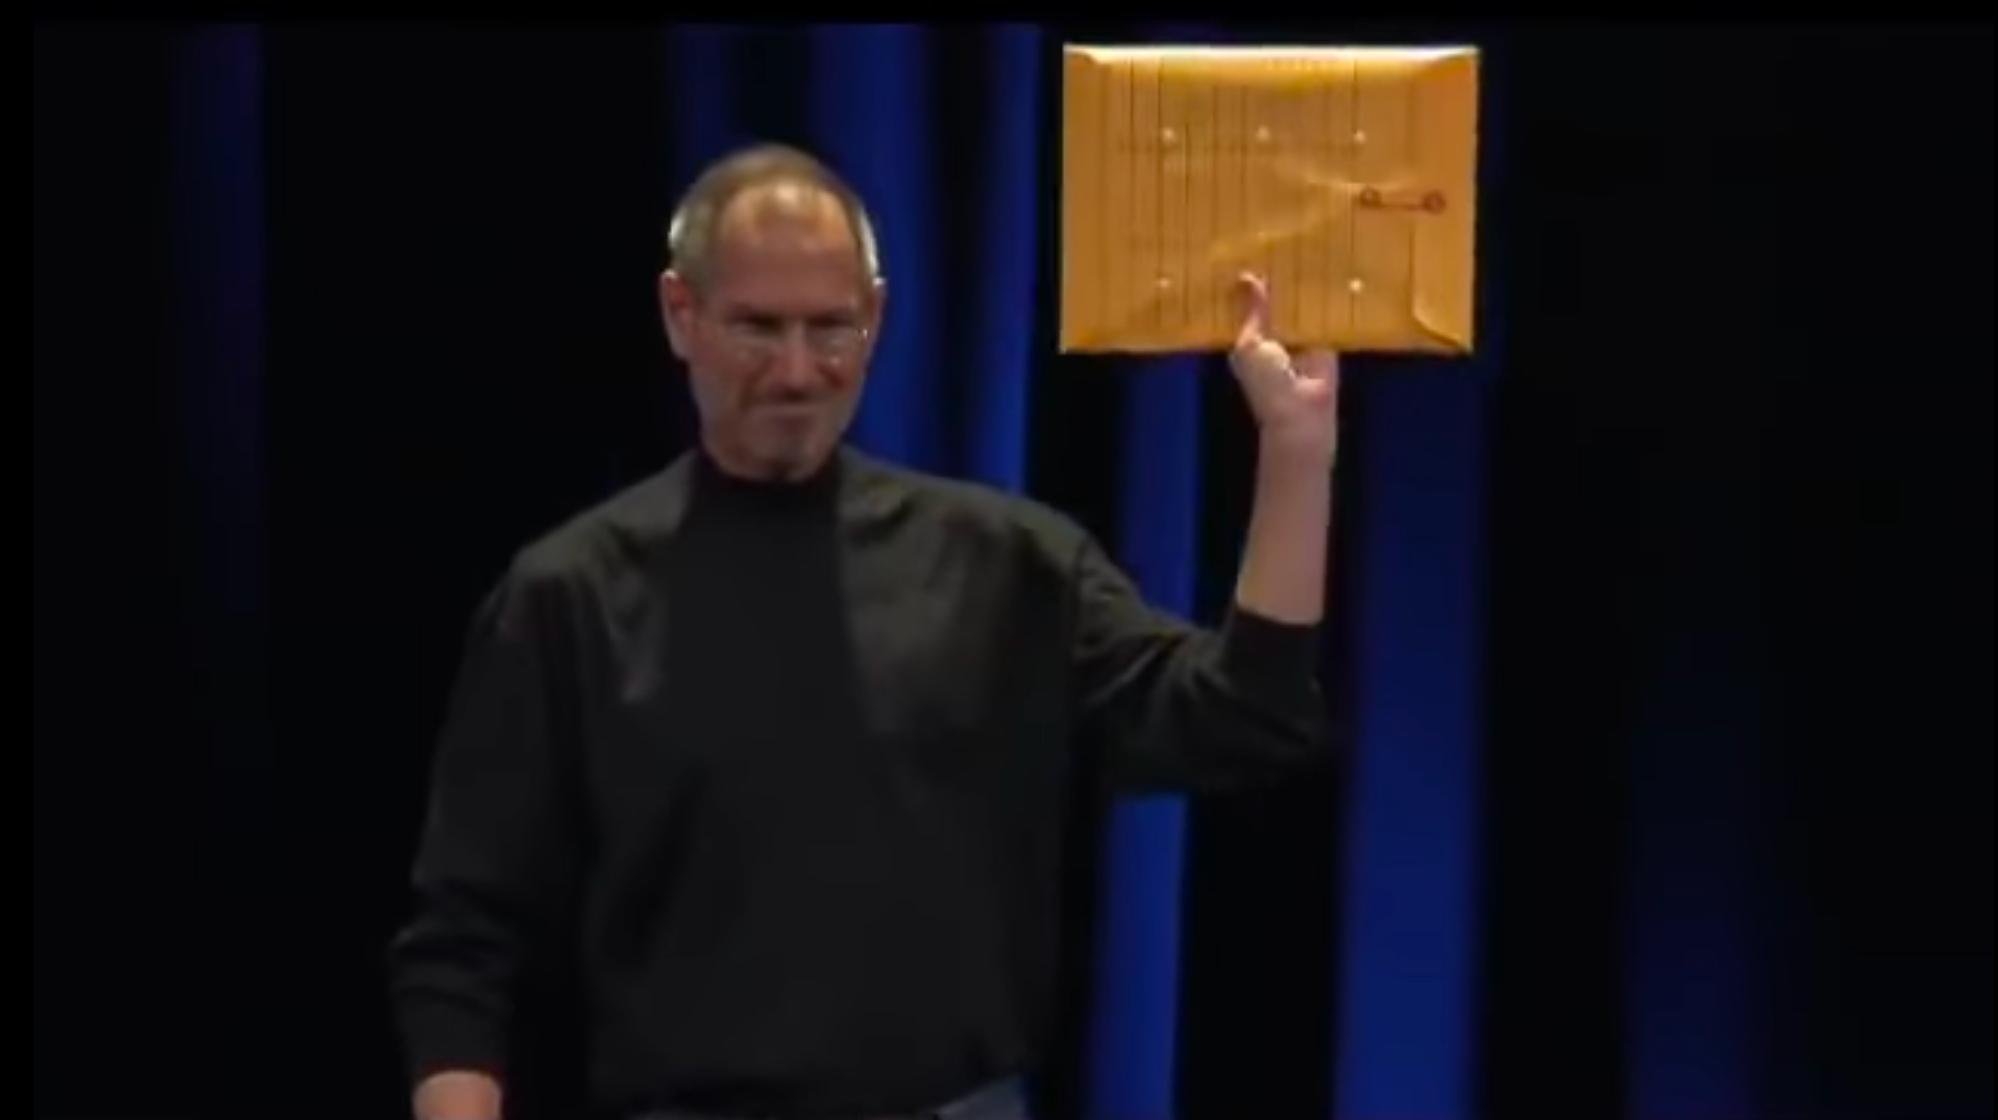 MacBook Air Introduction (2008) - Steve Jobs